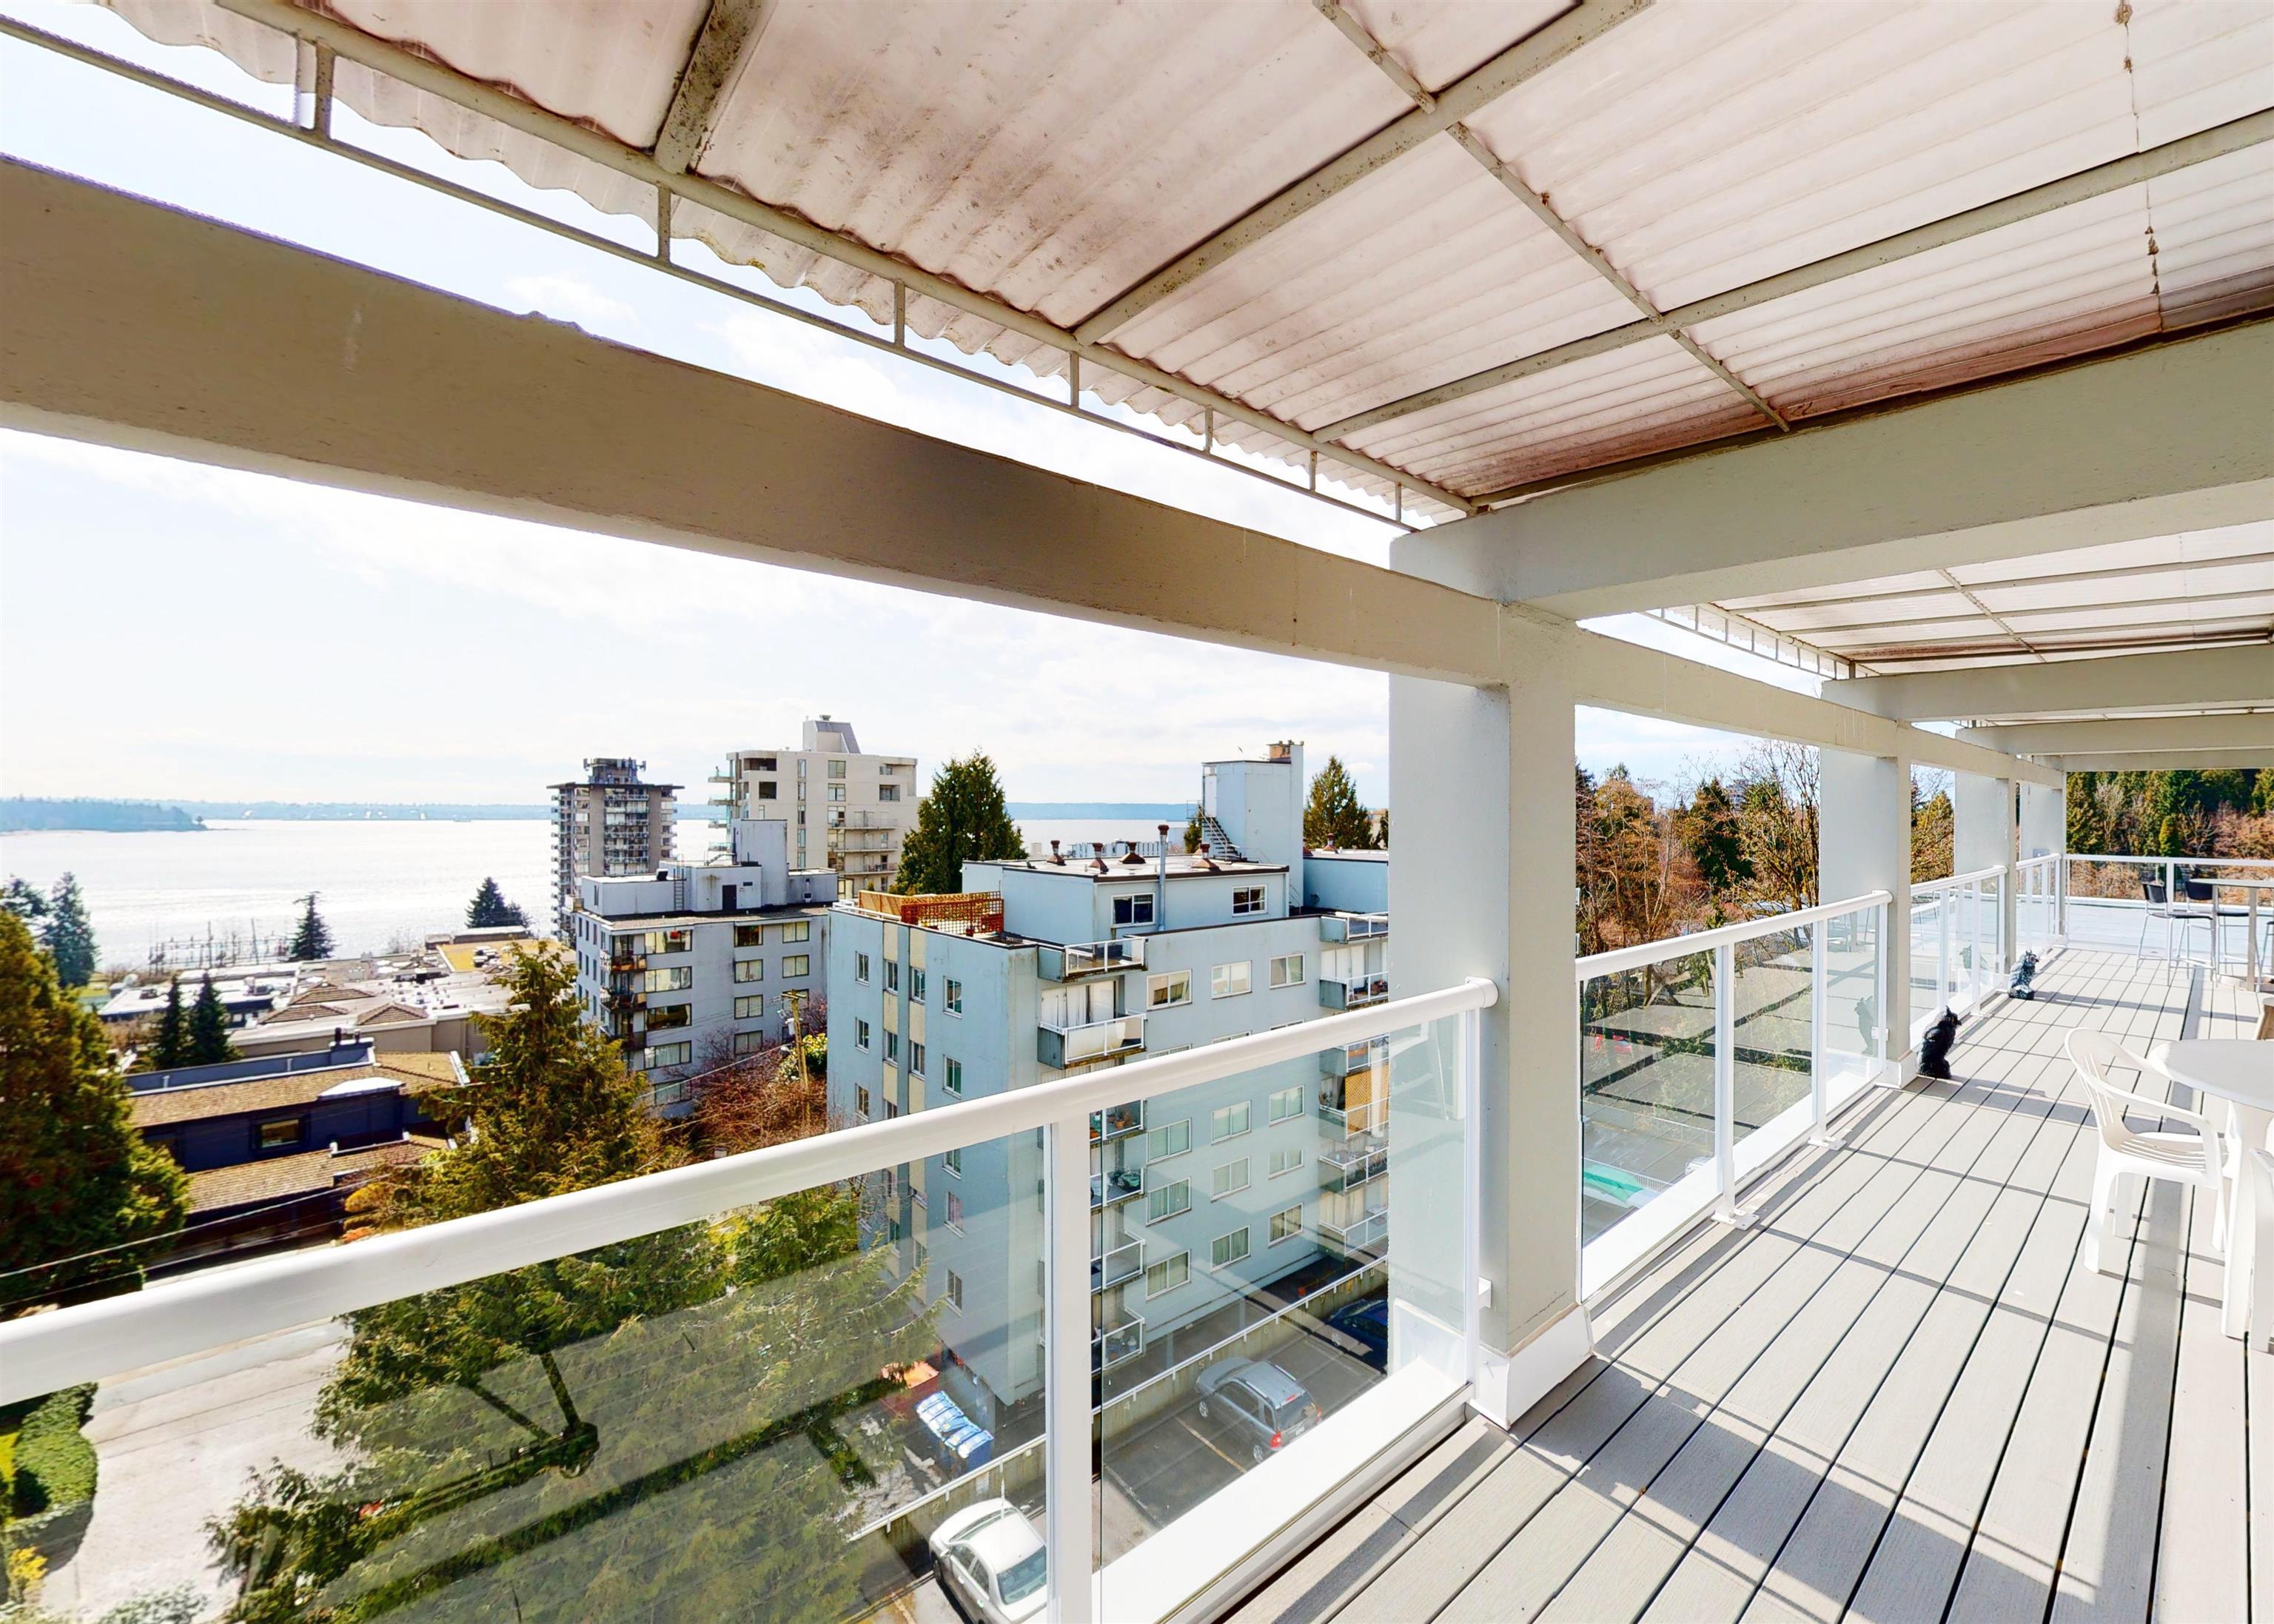 202 1750 ESQUIMALT AVENUE - Ambleside Apartment/Condo for sale, 1 Bedroom (R2610188) - #4